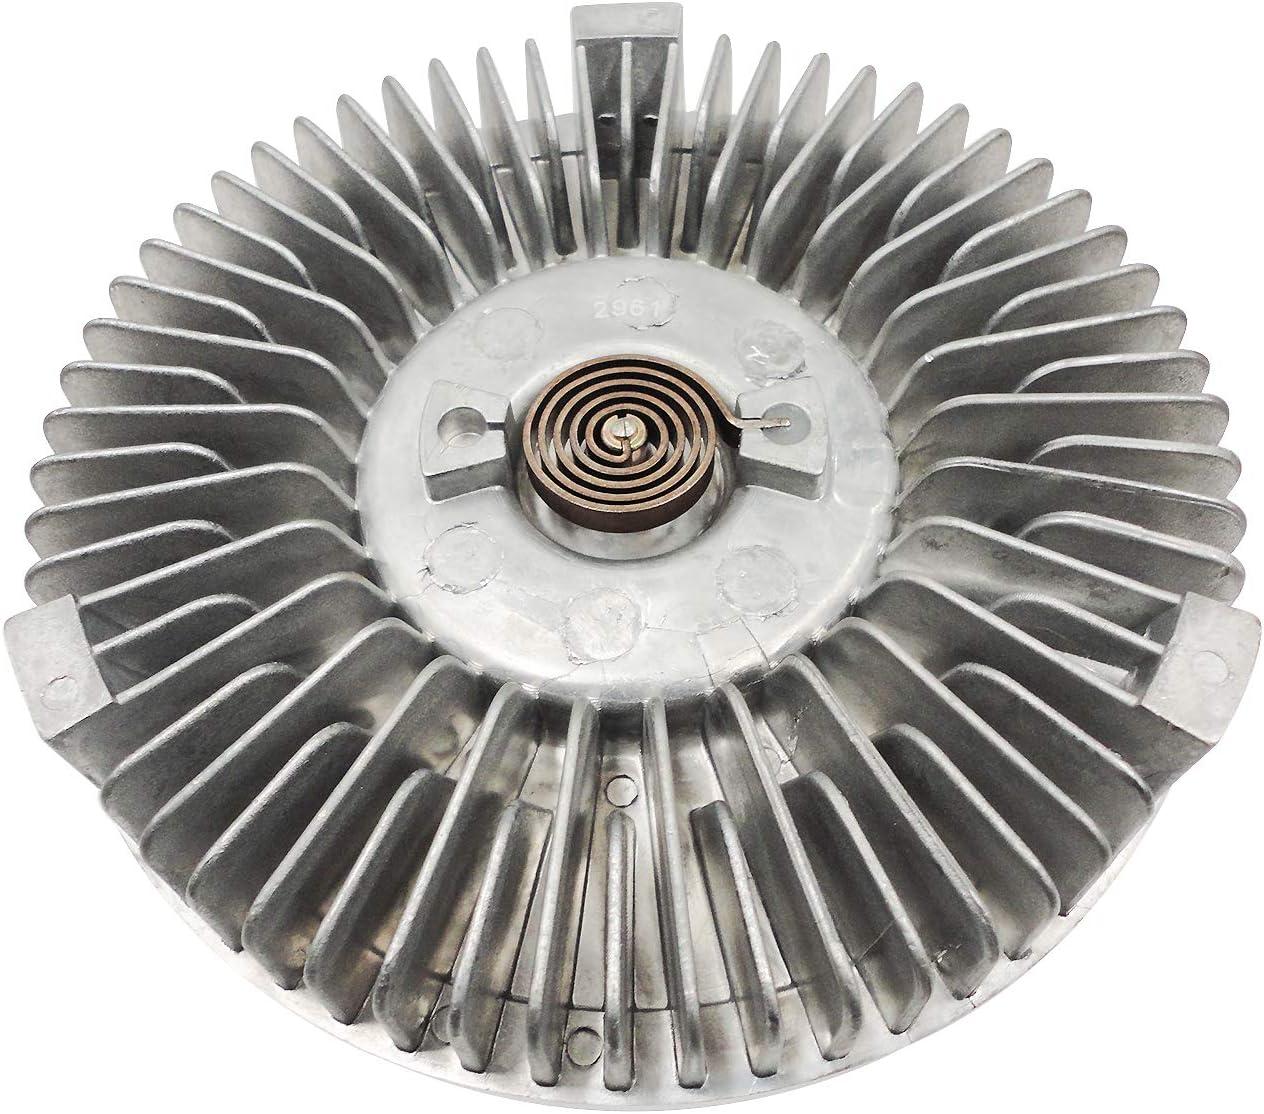 Engine Cooling Fan Clutch Radiator Fan Clutch for 2005-2010 Dodge Dakota V6 3.7L Replace#2961